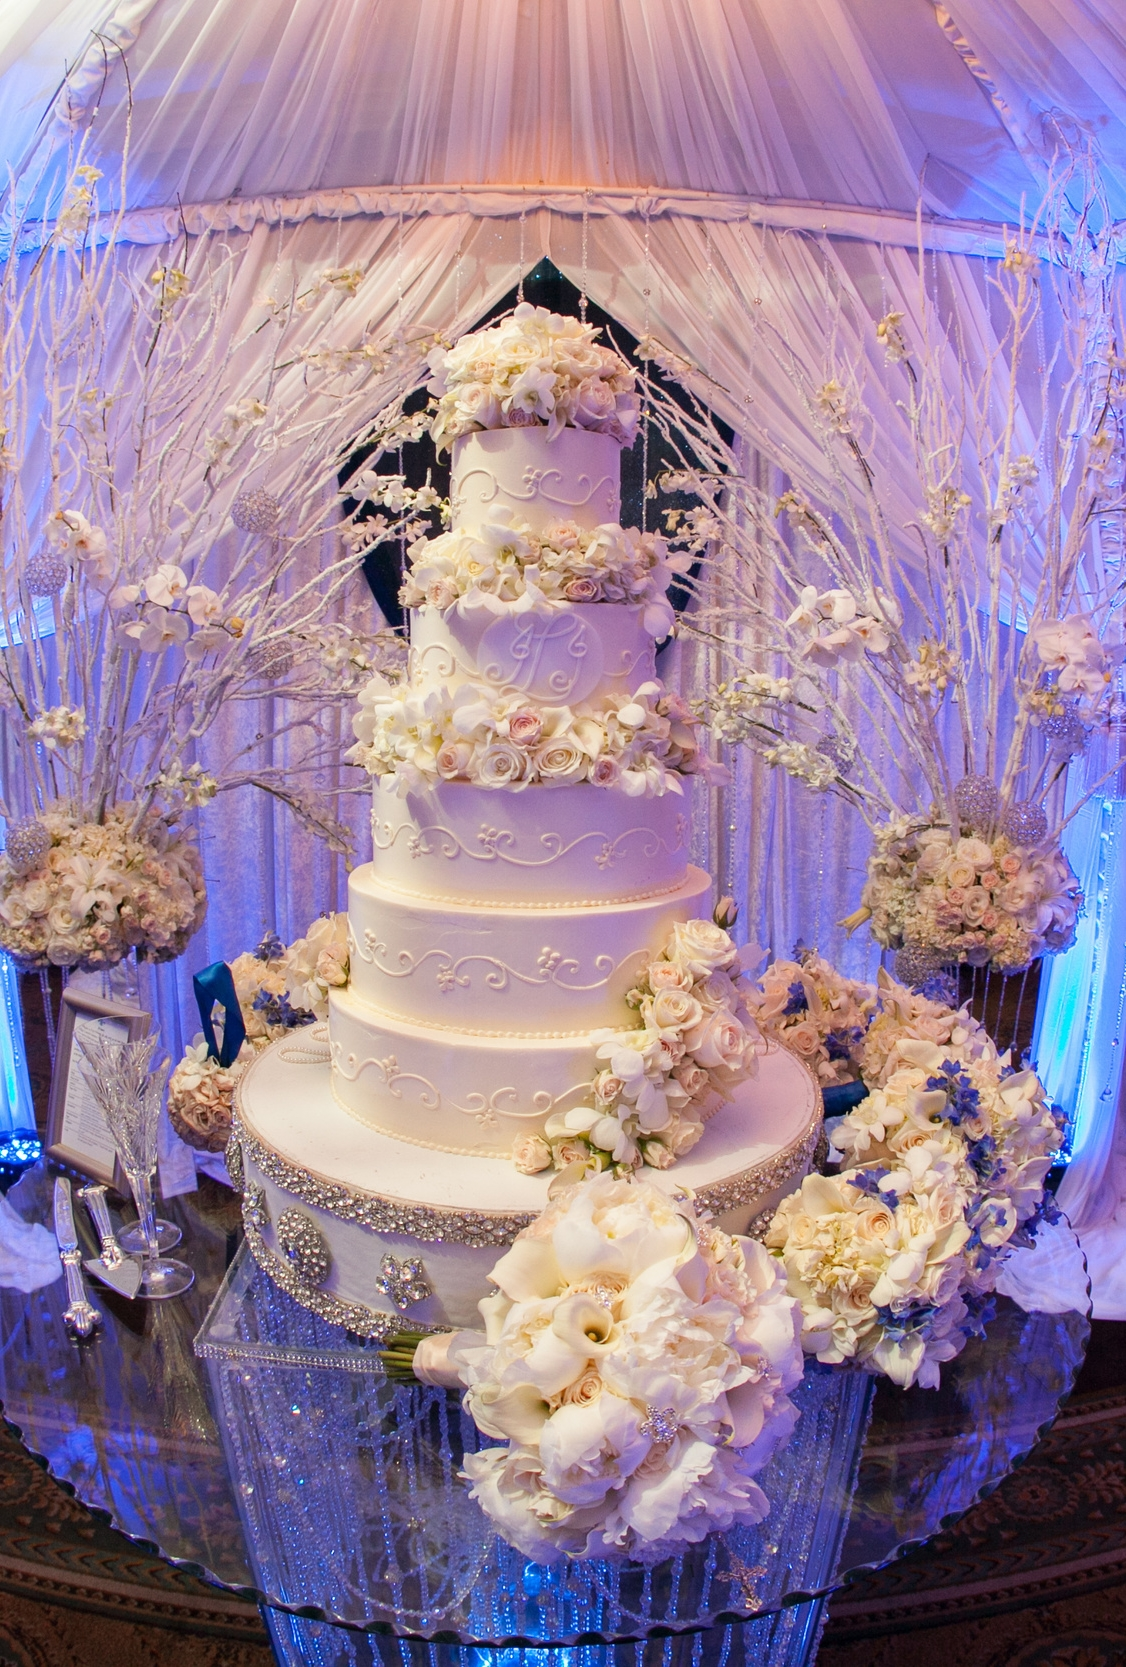 custom-wedding-cake-with-monogram.jpg